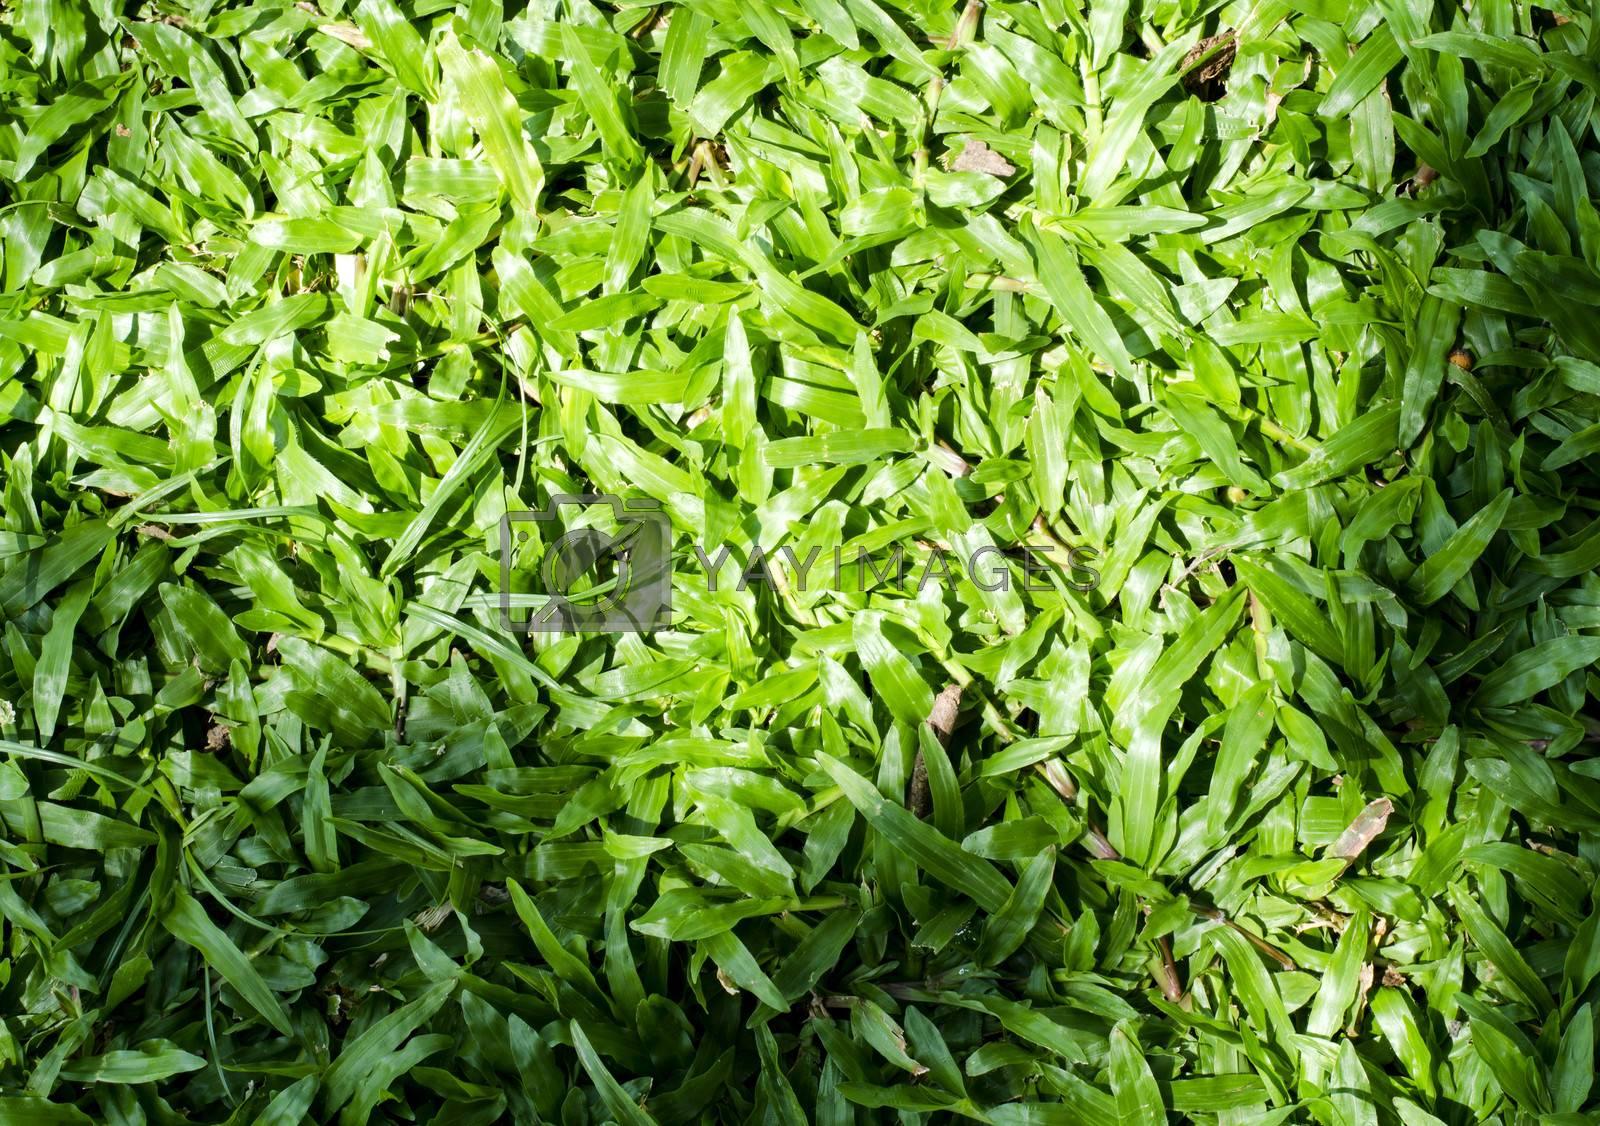 shadow on green grass background by Nisakorn Neera